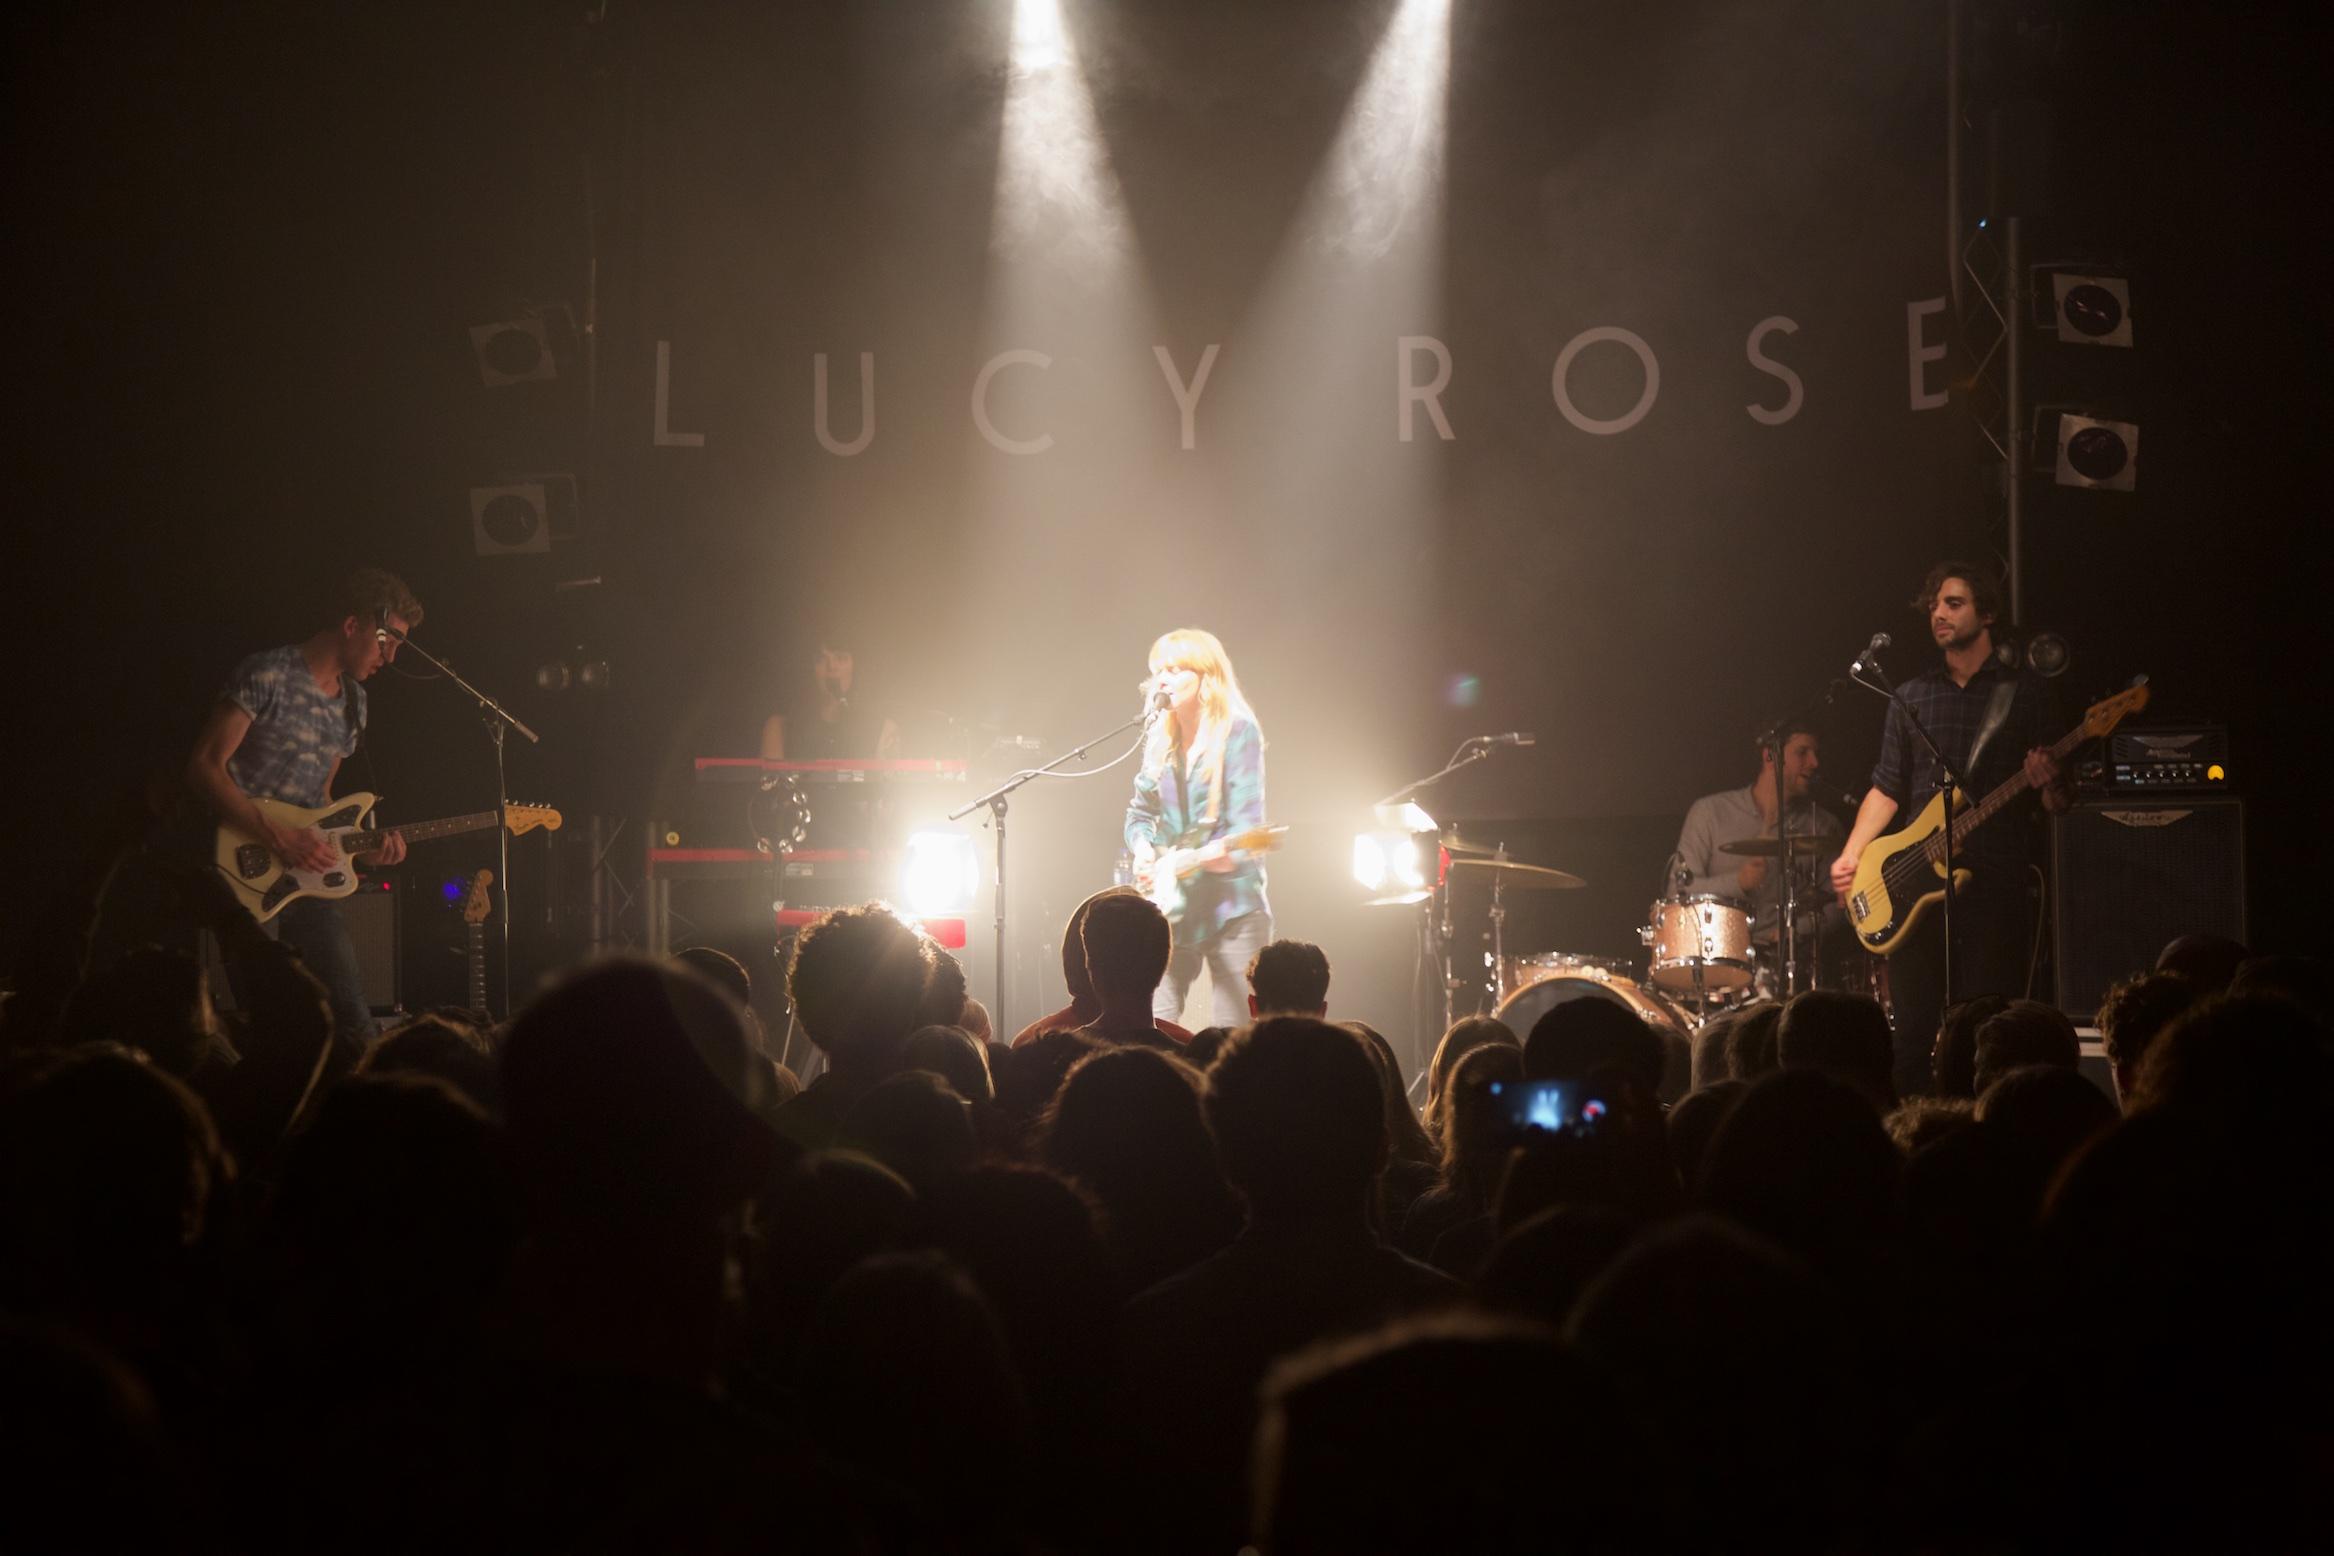 Lucy Rose © Marc Aitken 2015. www.marcaitken.com35.jpg